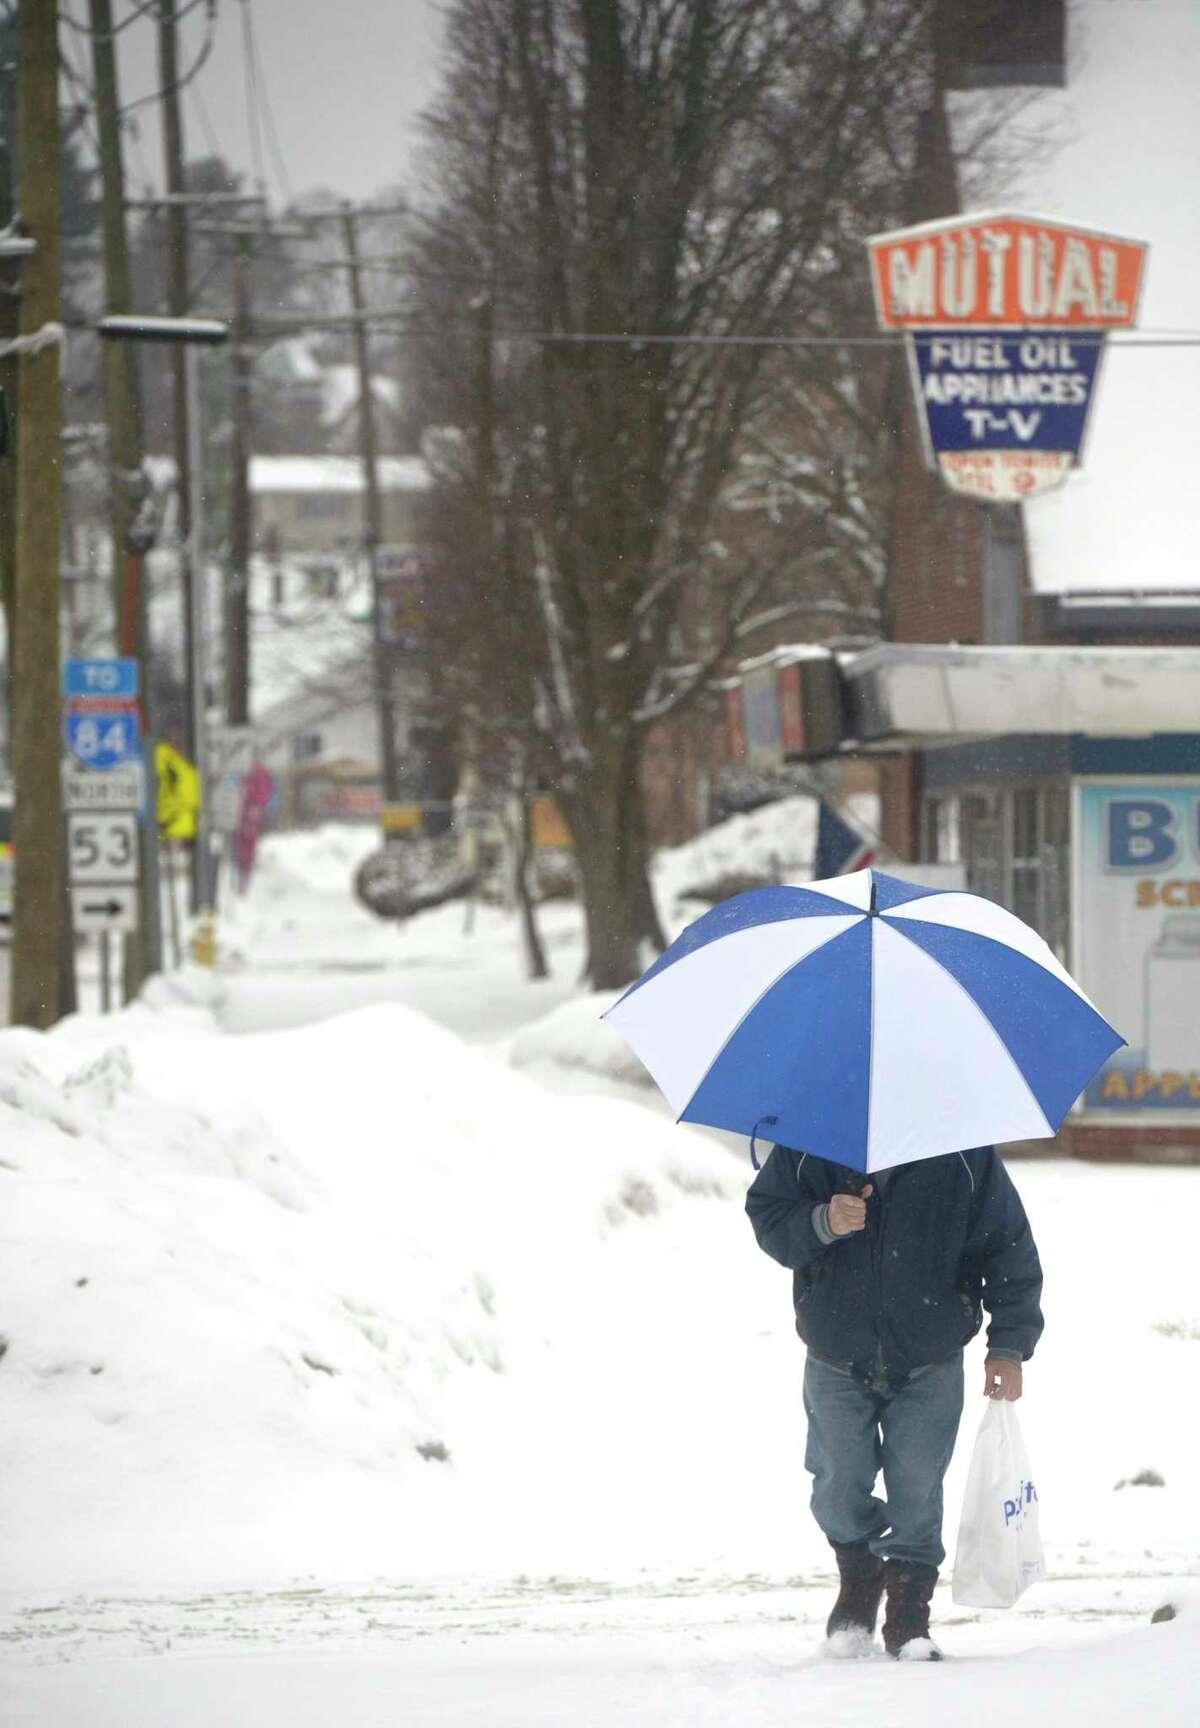 John Dlugozima, of Danbury, walks home from the store during Thursdays snow storm. February 18, 2021, in Danbury, Conn.